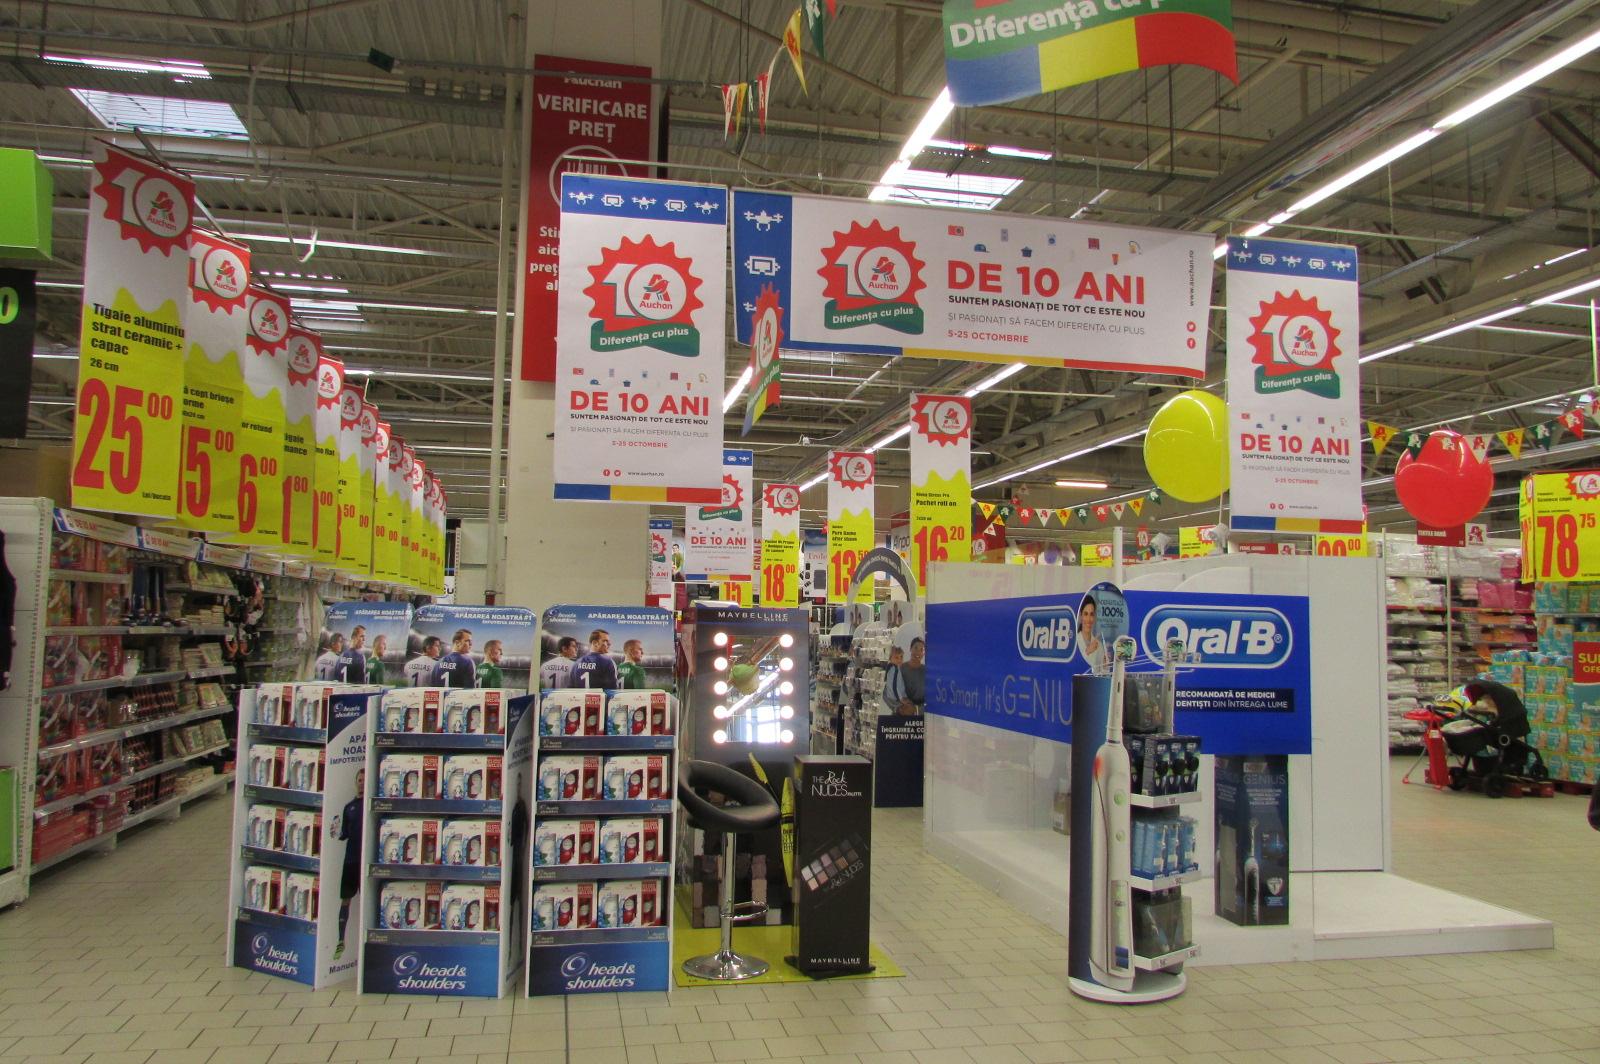 Auchan s rb tore te 10 ani de prezen pe pia a din rom nia for Email auchan